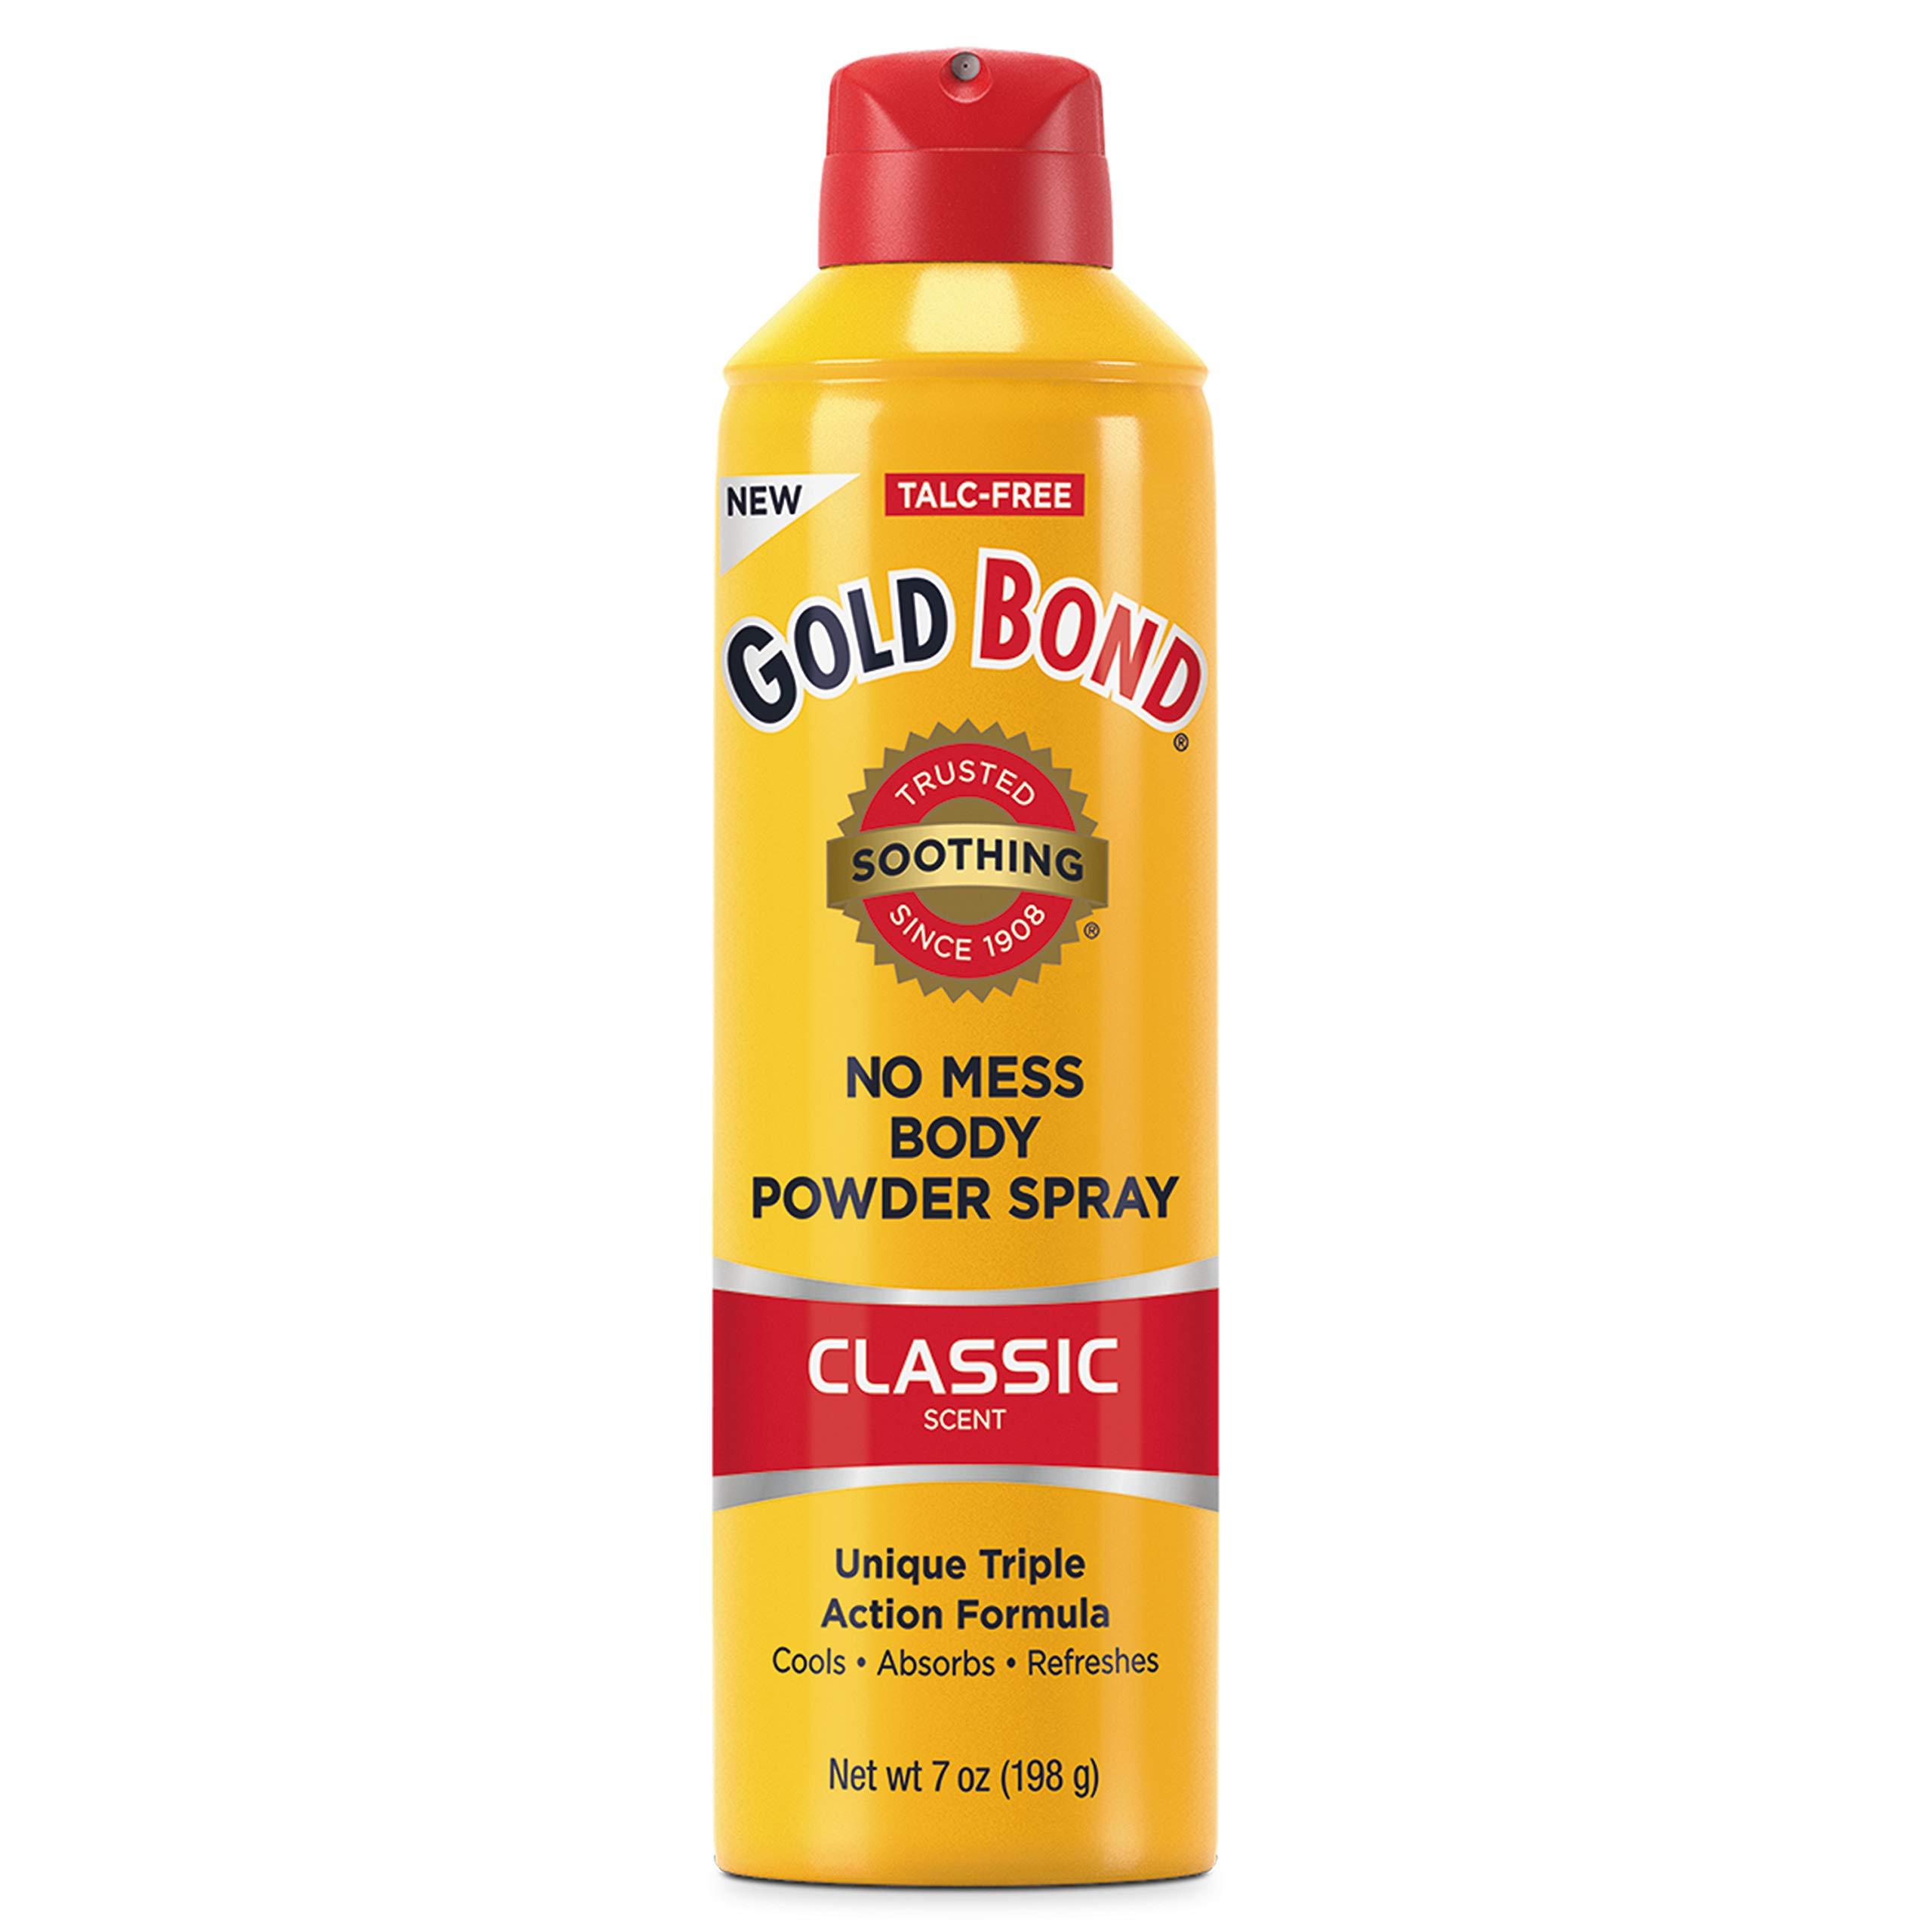 Gold Bond No Mess Talc-Free Body Powder Spray, 7 oz, Classic Scent